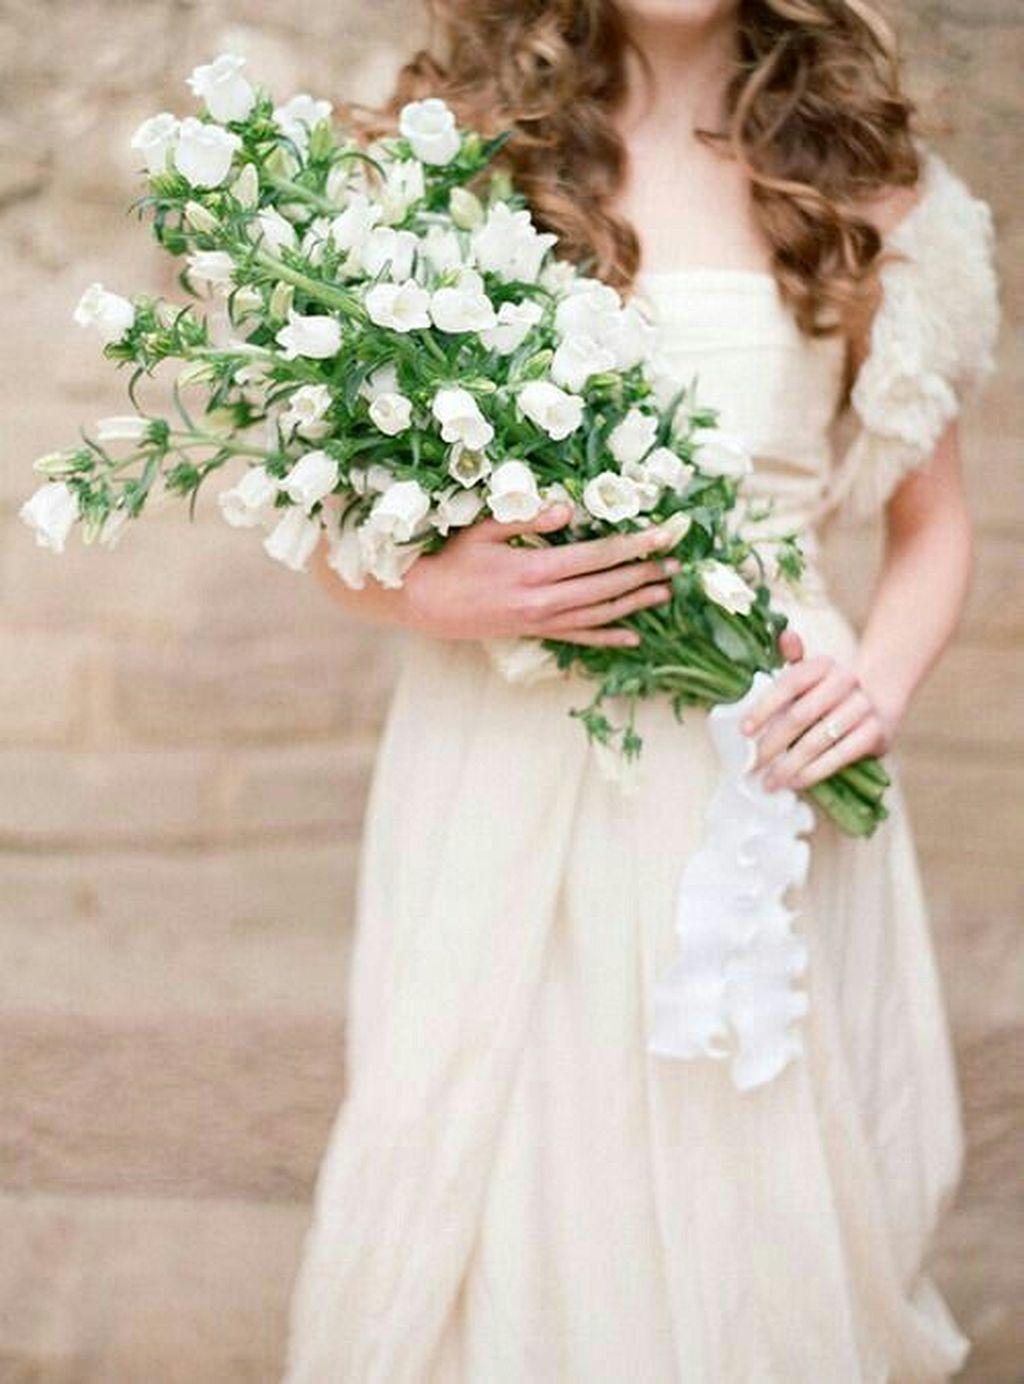 23 beautiful pageant hand bouquet wedding hand bouquet bouquet stunning 23 beautiful pageant hand bouquet wedding httpsweddmagz23 izmirmasajfo